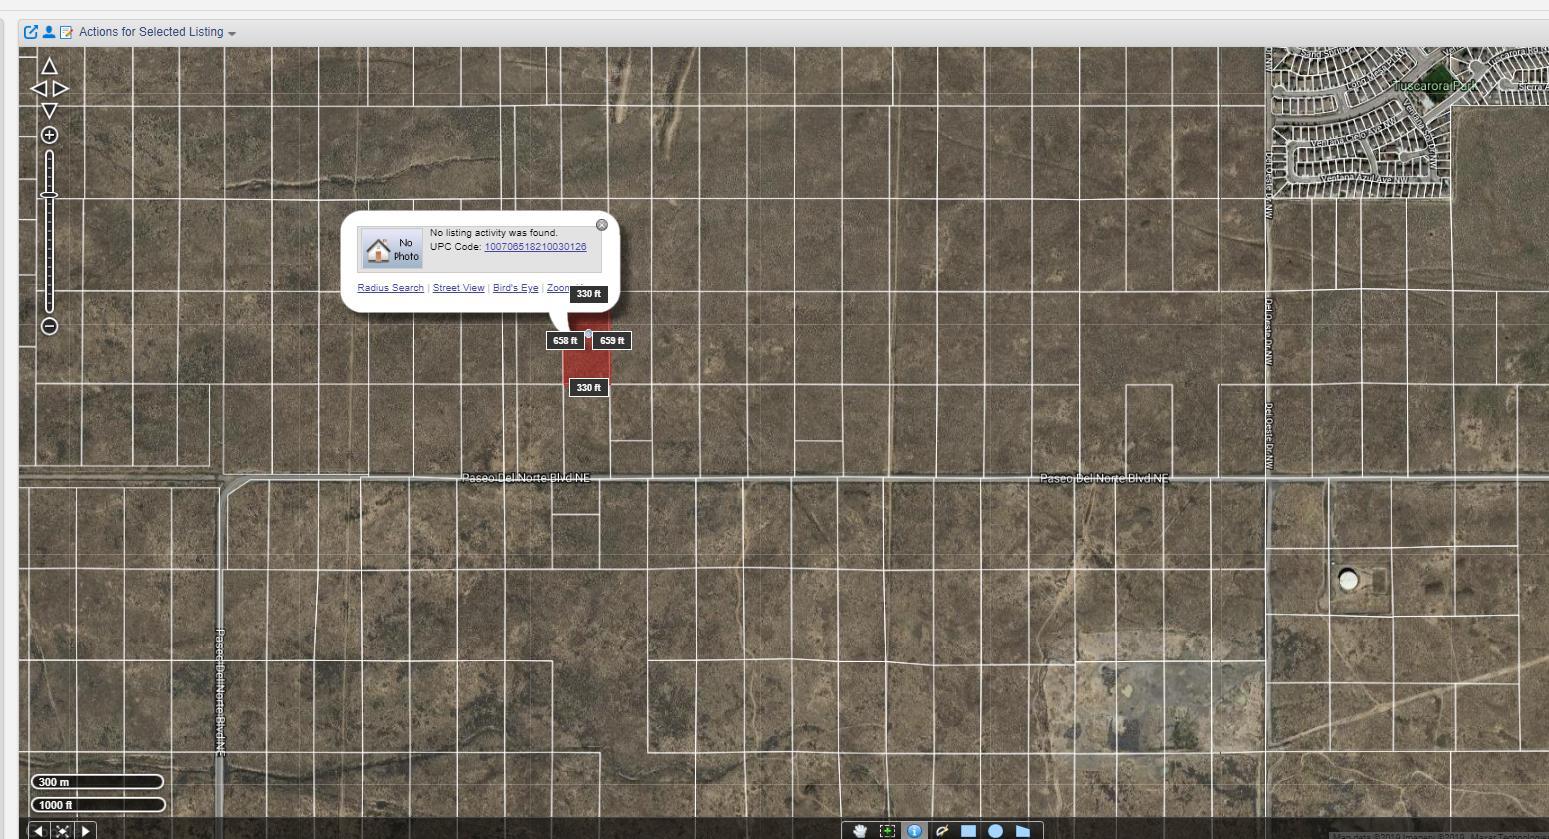 000 Paseo Del Norte Property Photo - Albuquerque, NM real estate listing